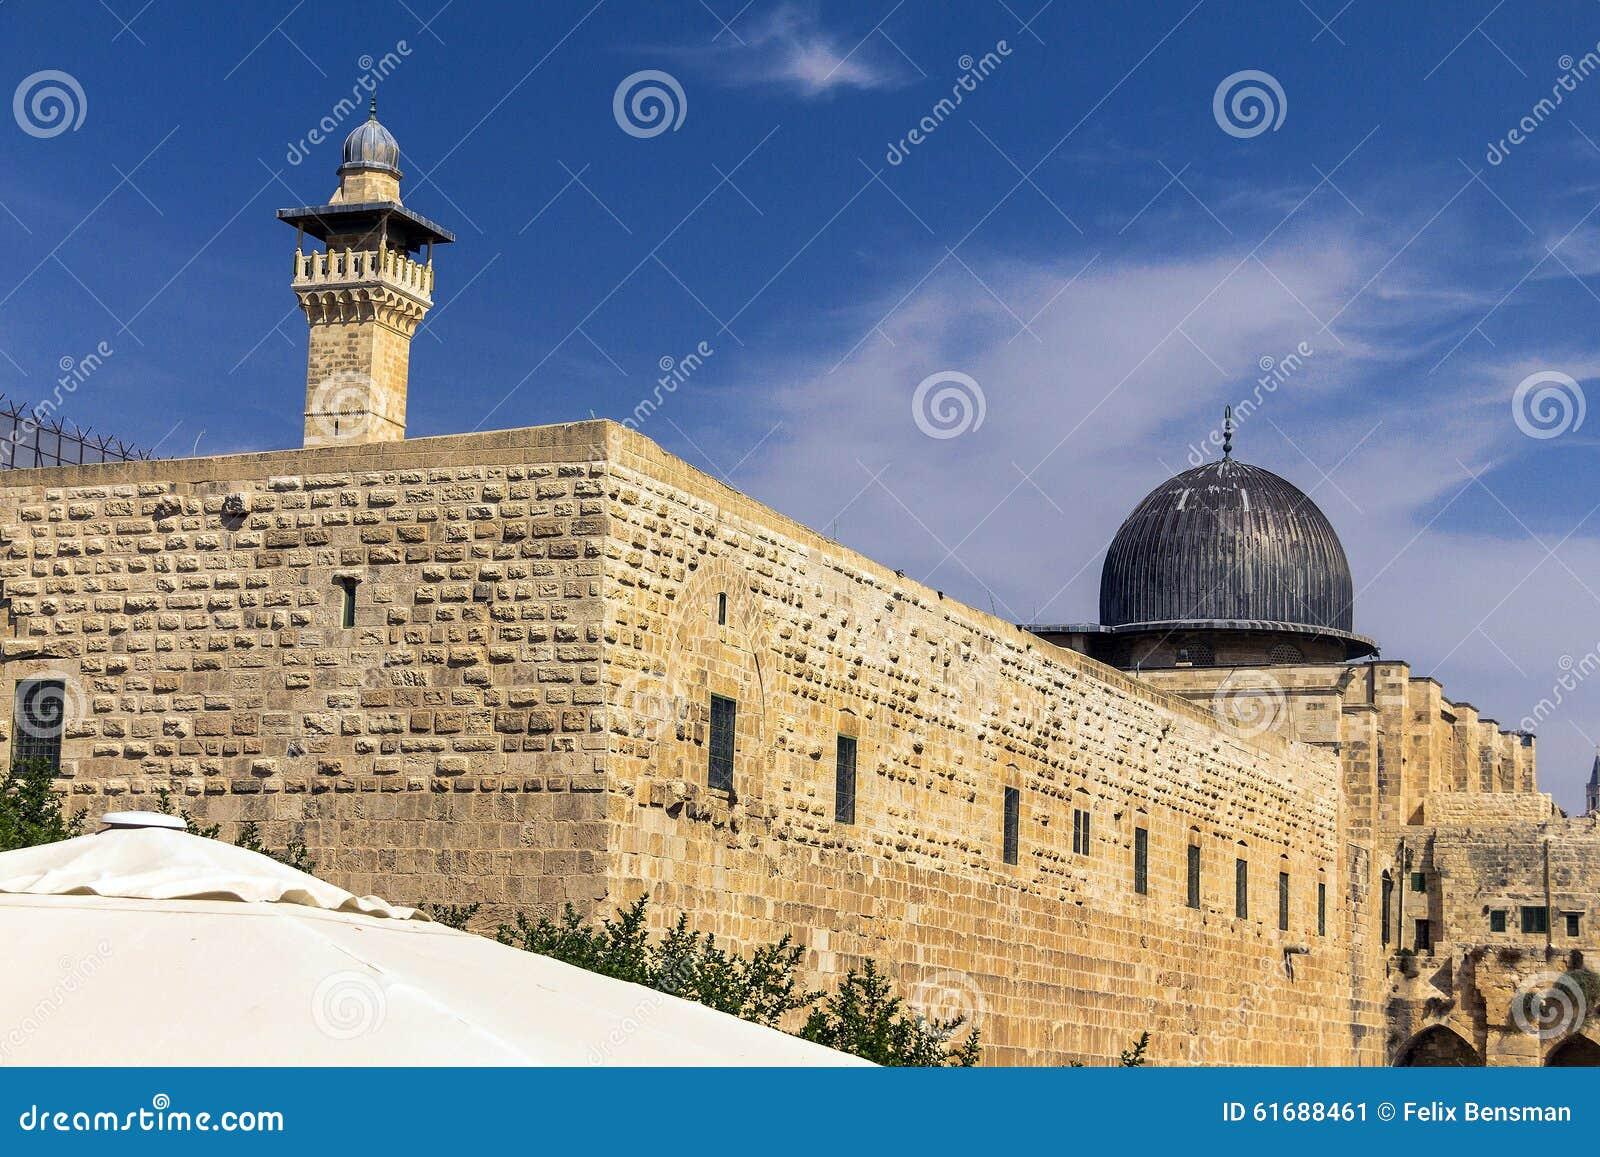 Les sites de rencontre dans l'islam